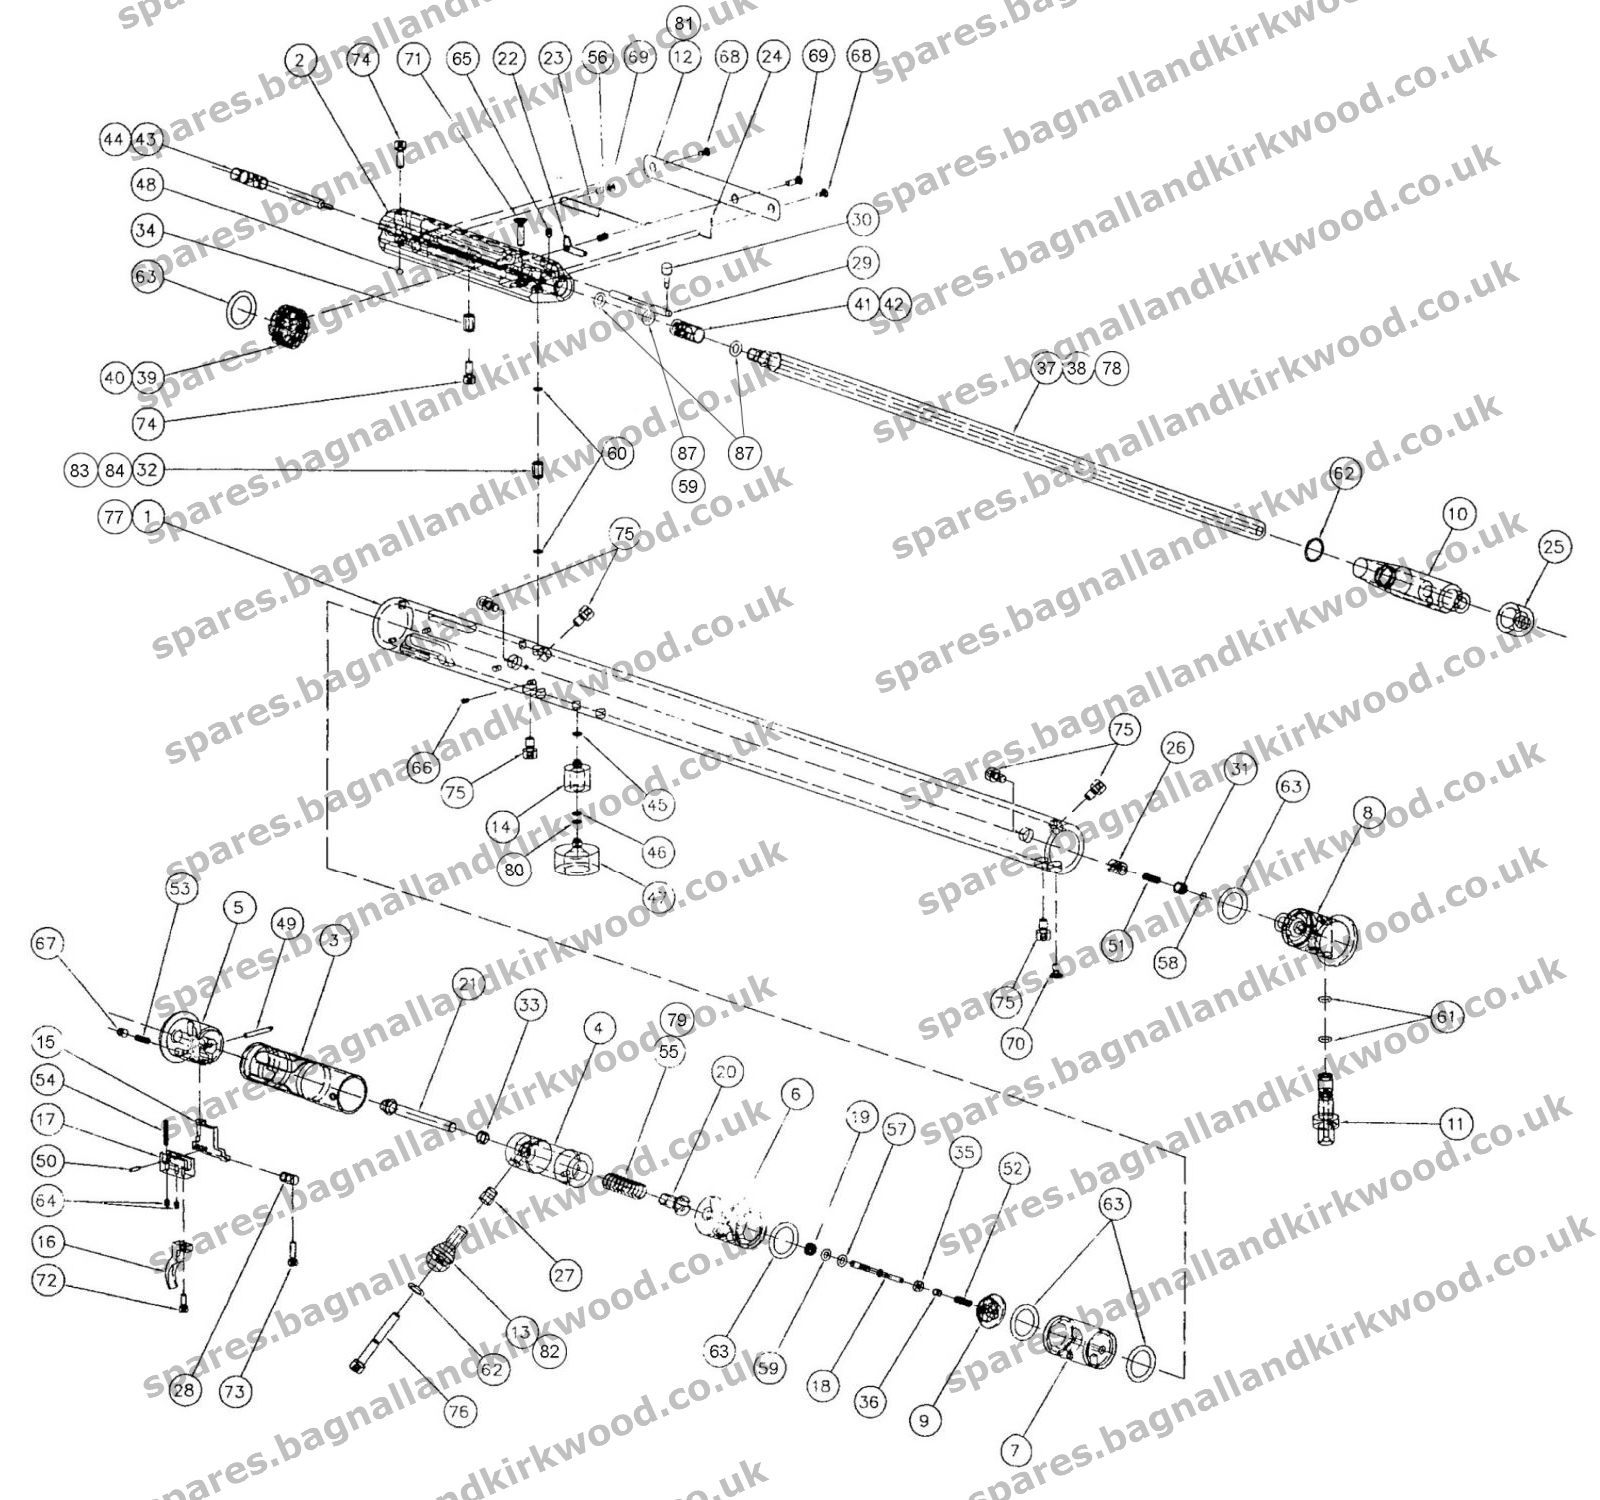 Logun Axsor Spare Parts Bagnall And Kirkwood Airgun Spares Bobcat 753 Wiring Diagram